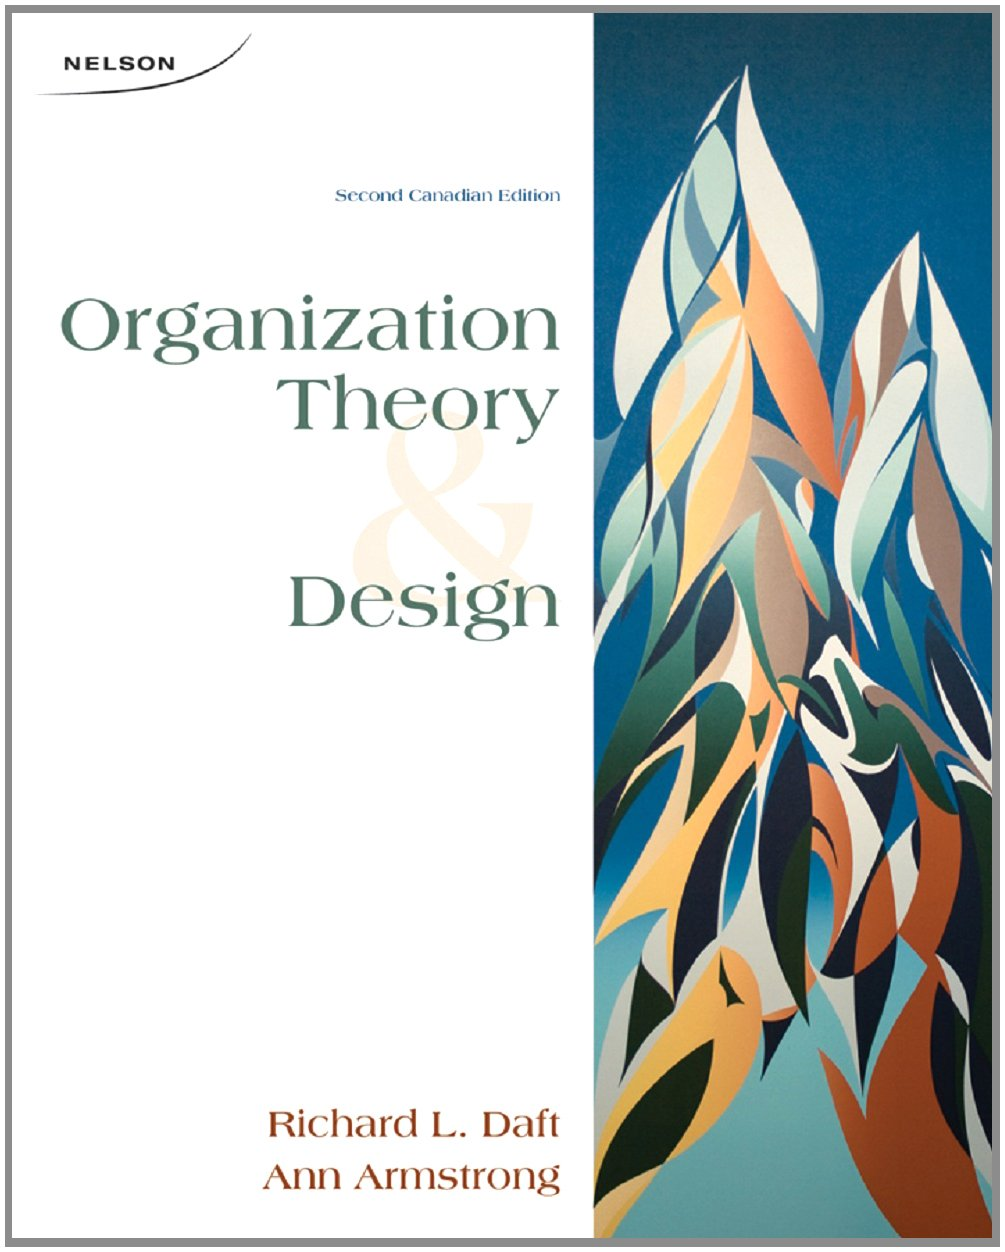 Organization Theory Design Ca Richard L Daft Ann Armstrong 9780176503680 Amazon Com Books